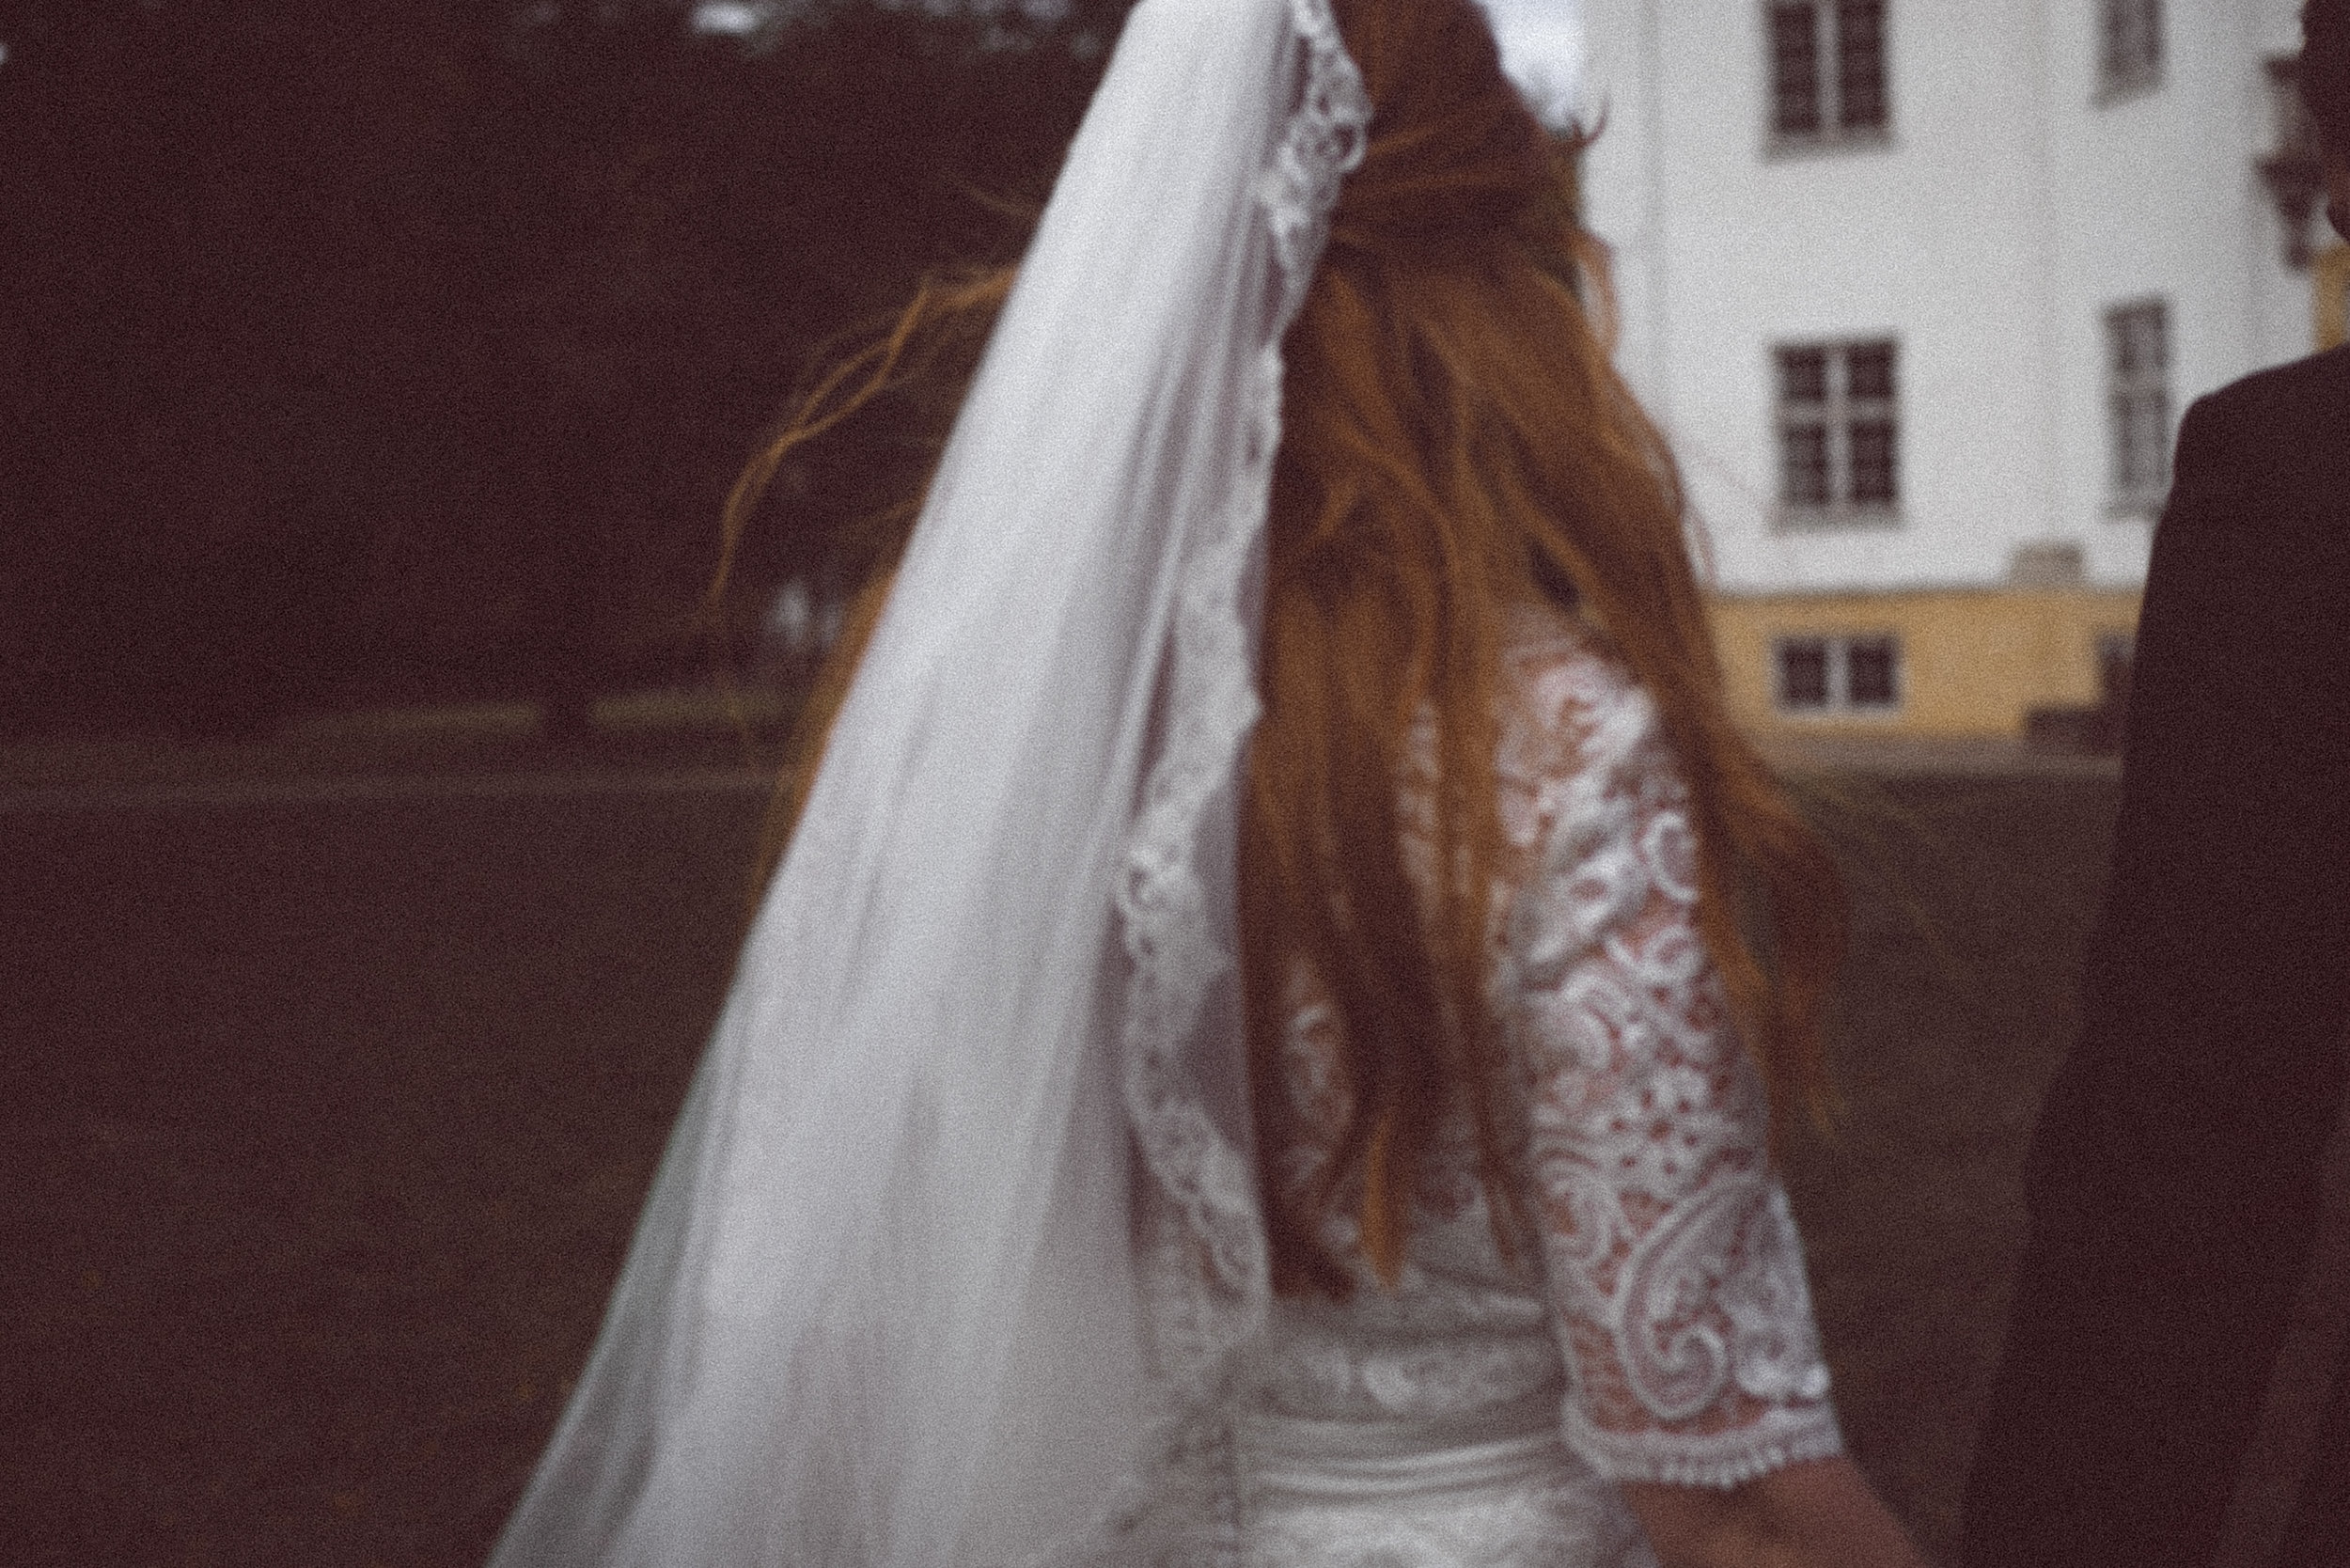 York Region Ontario Wedding Photographer - Bride + Groom-52.jpg